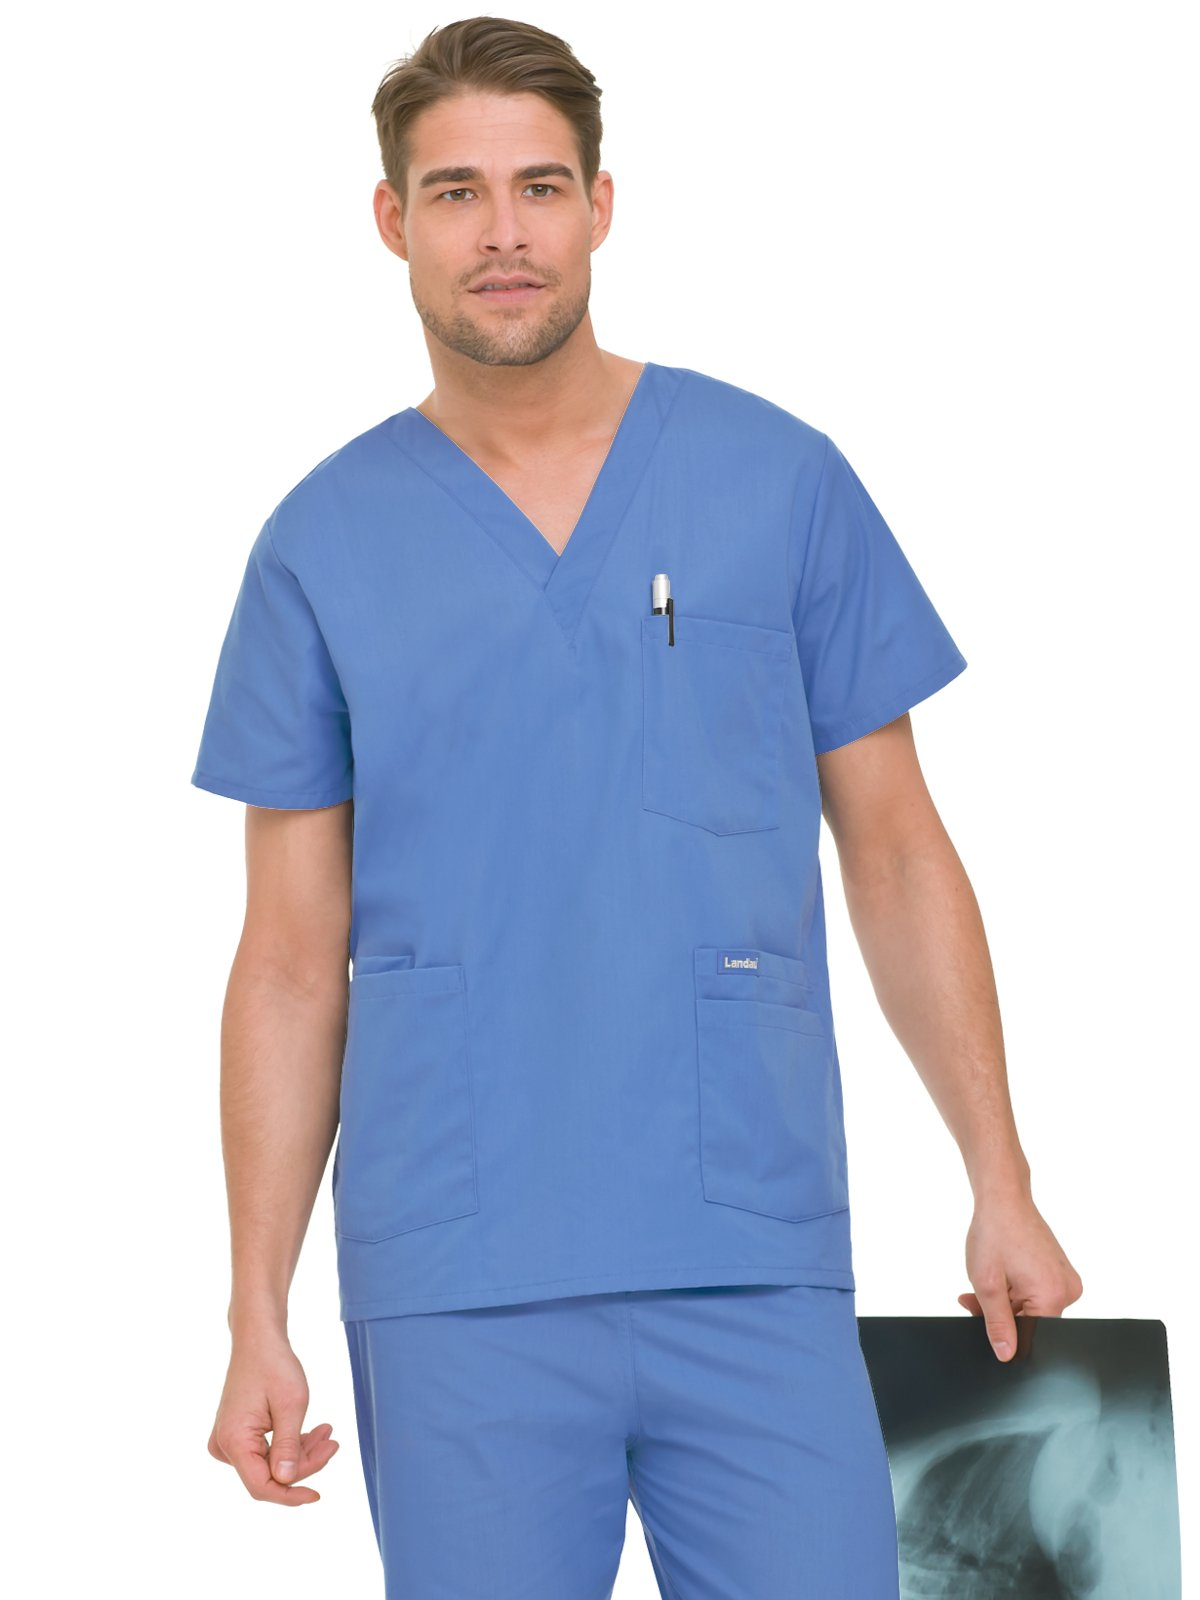 Landau Essentials Men's 5-Pocket Scrub Top Ceil Blue L